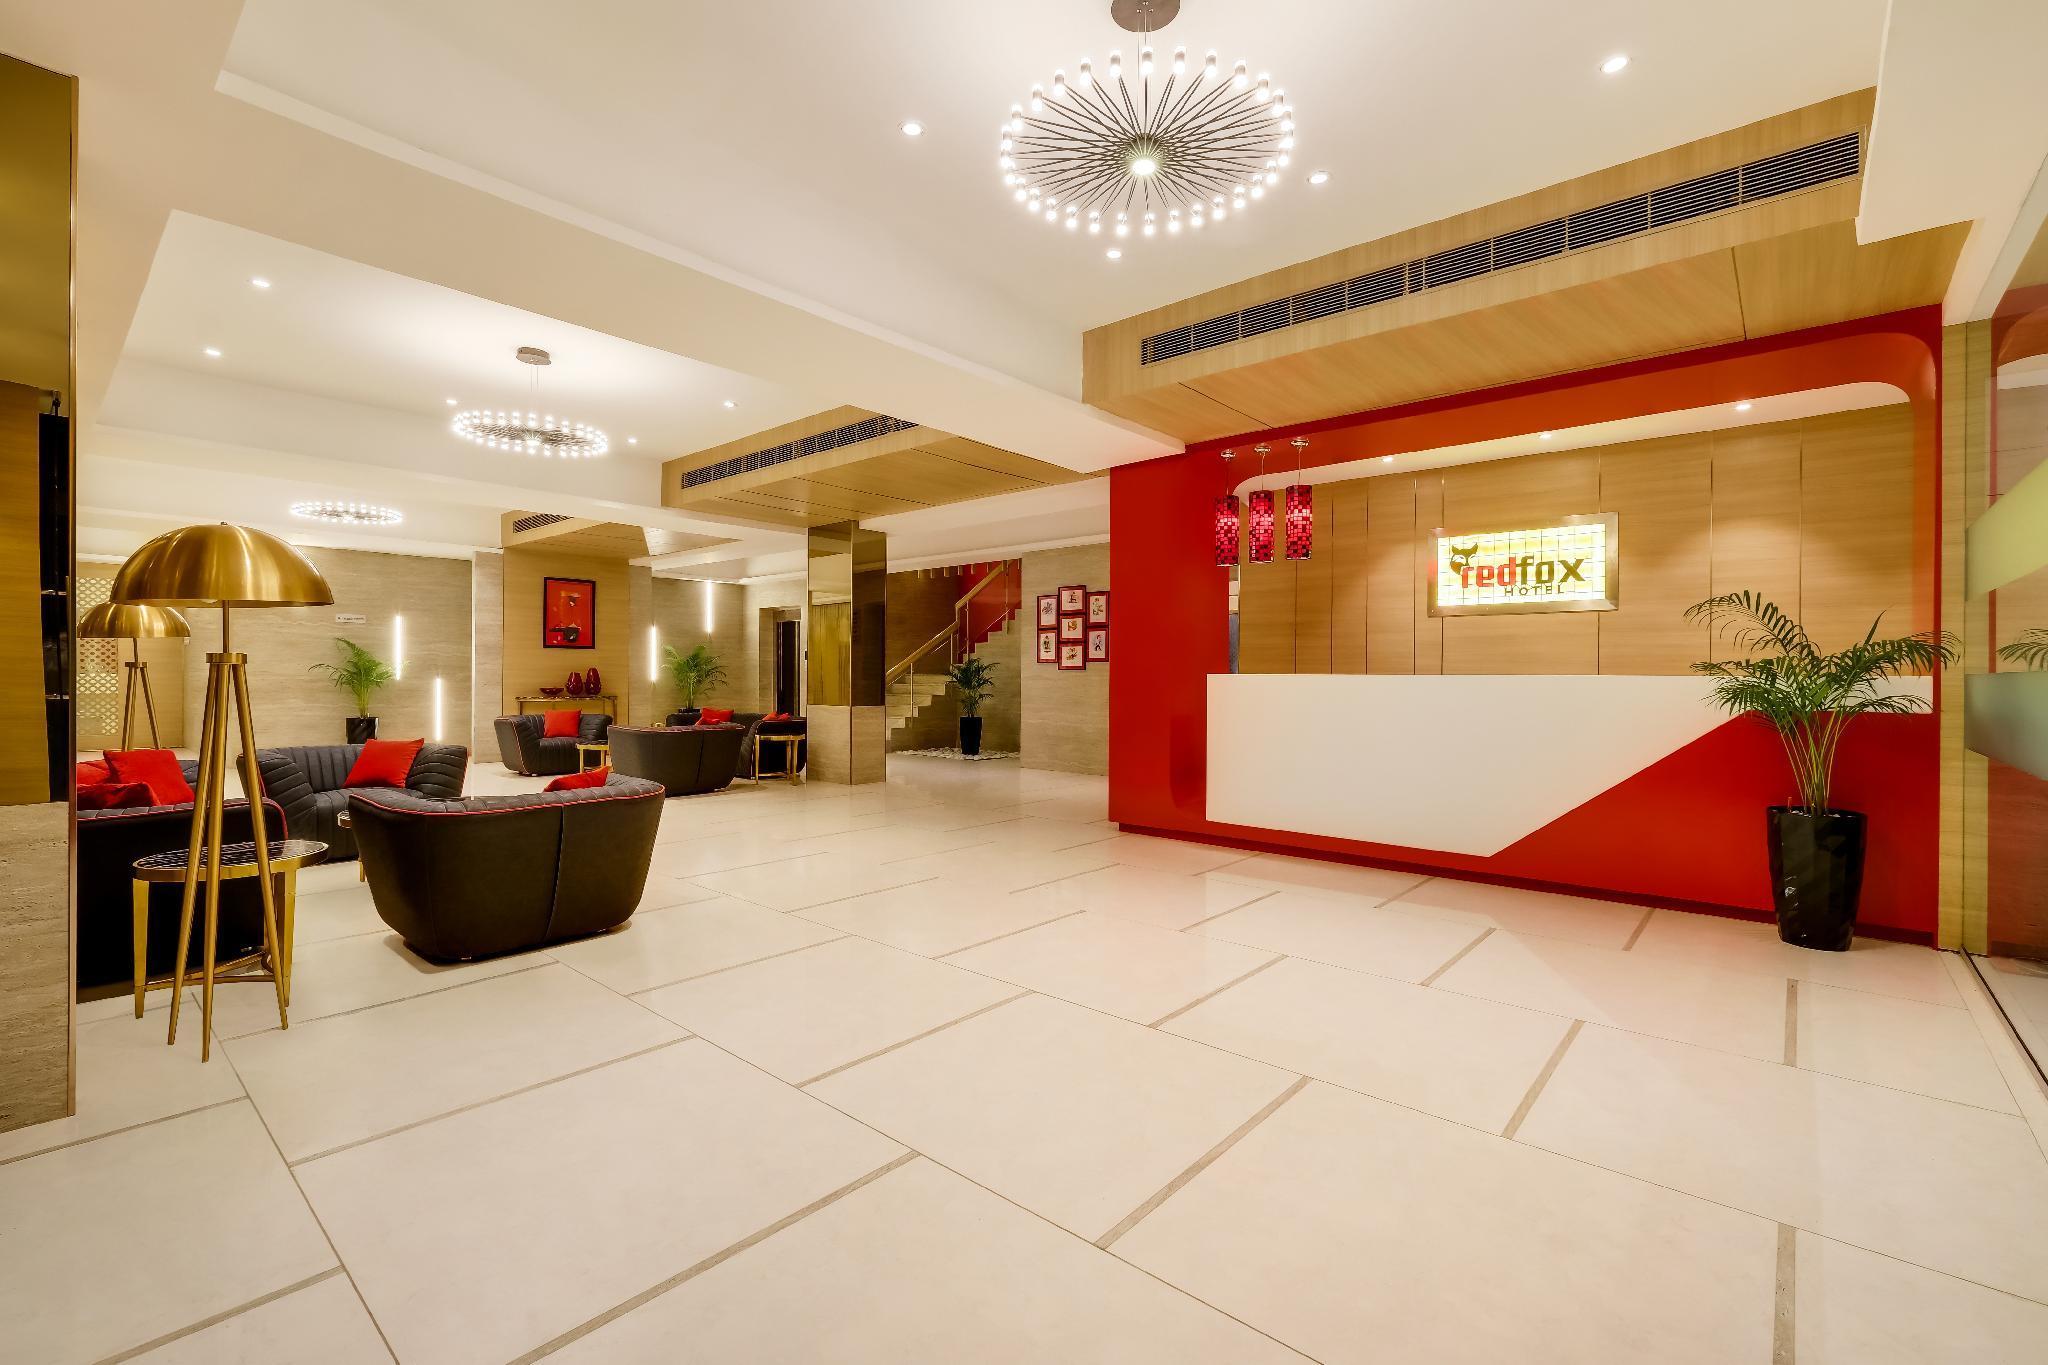 Red Fox Hotel Vijayawada